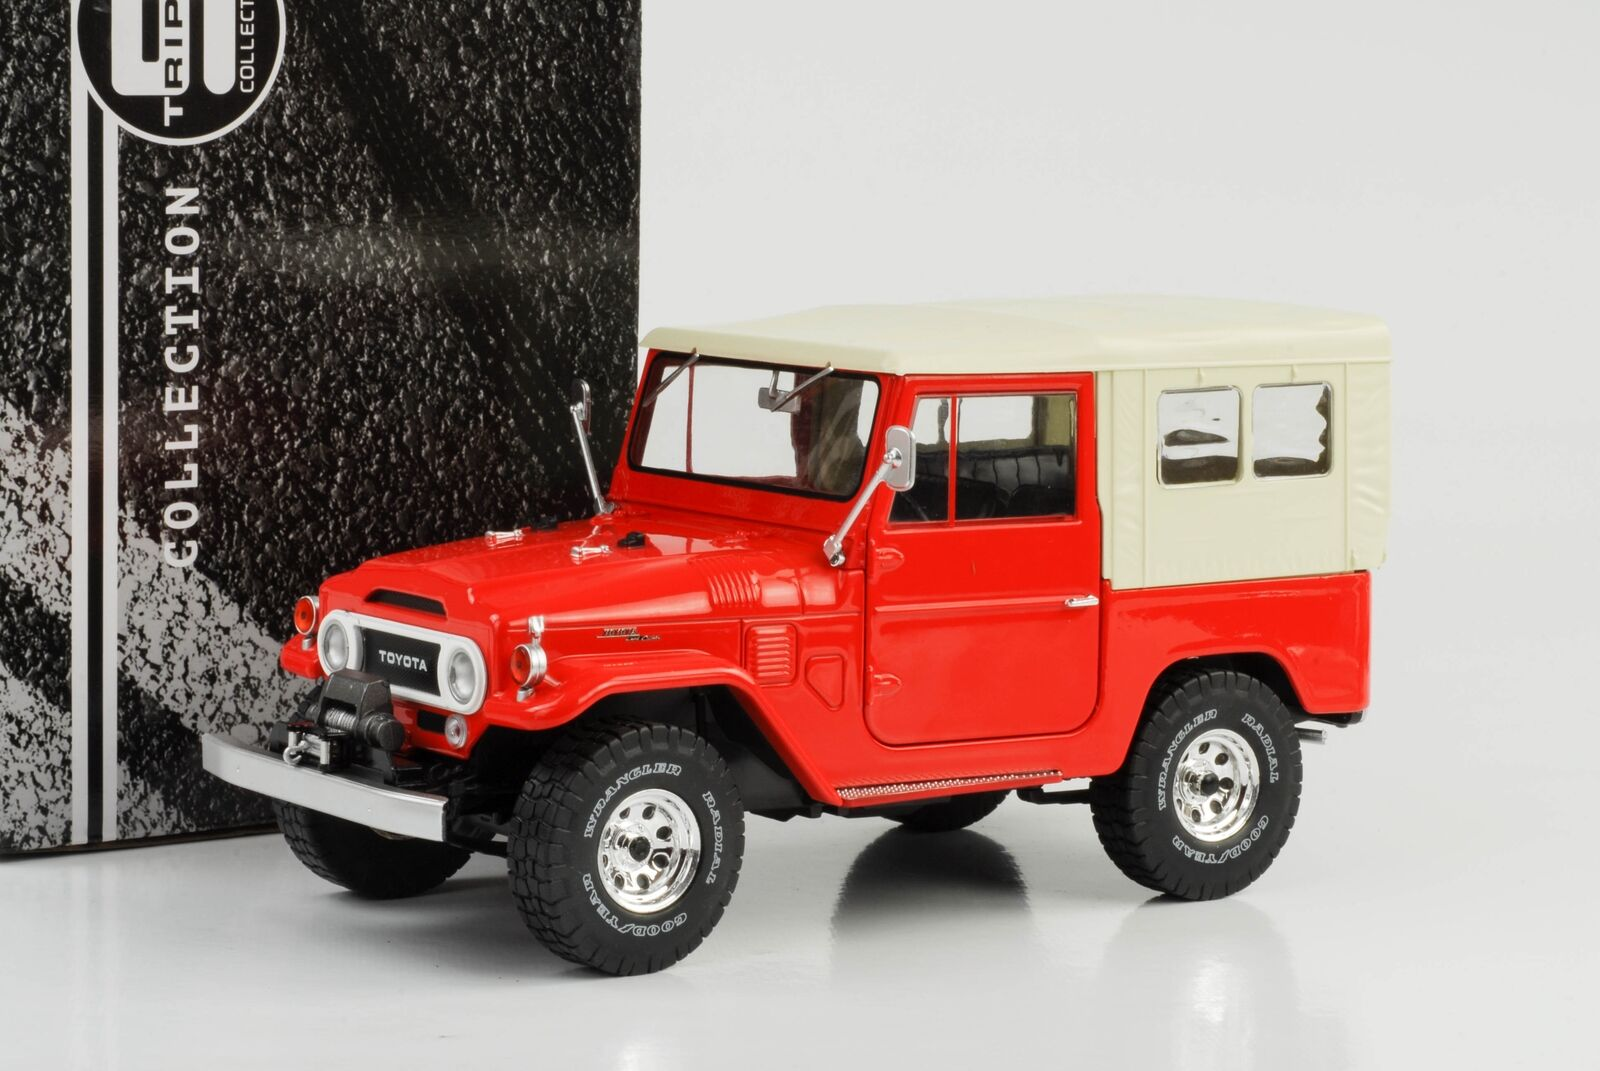 Toyota Land Cruiser fj40 1967 Rouge Softtop Beige 1 18 Triple 9 Miniature